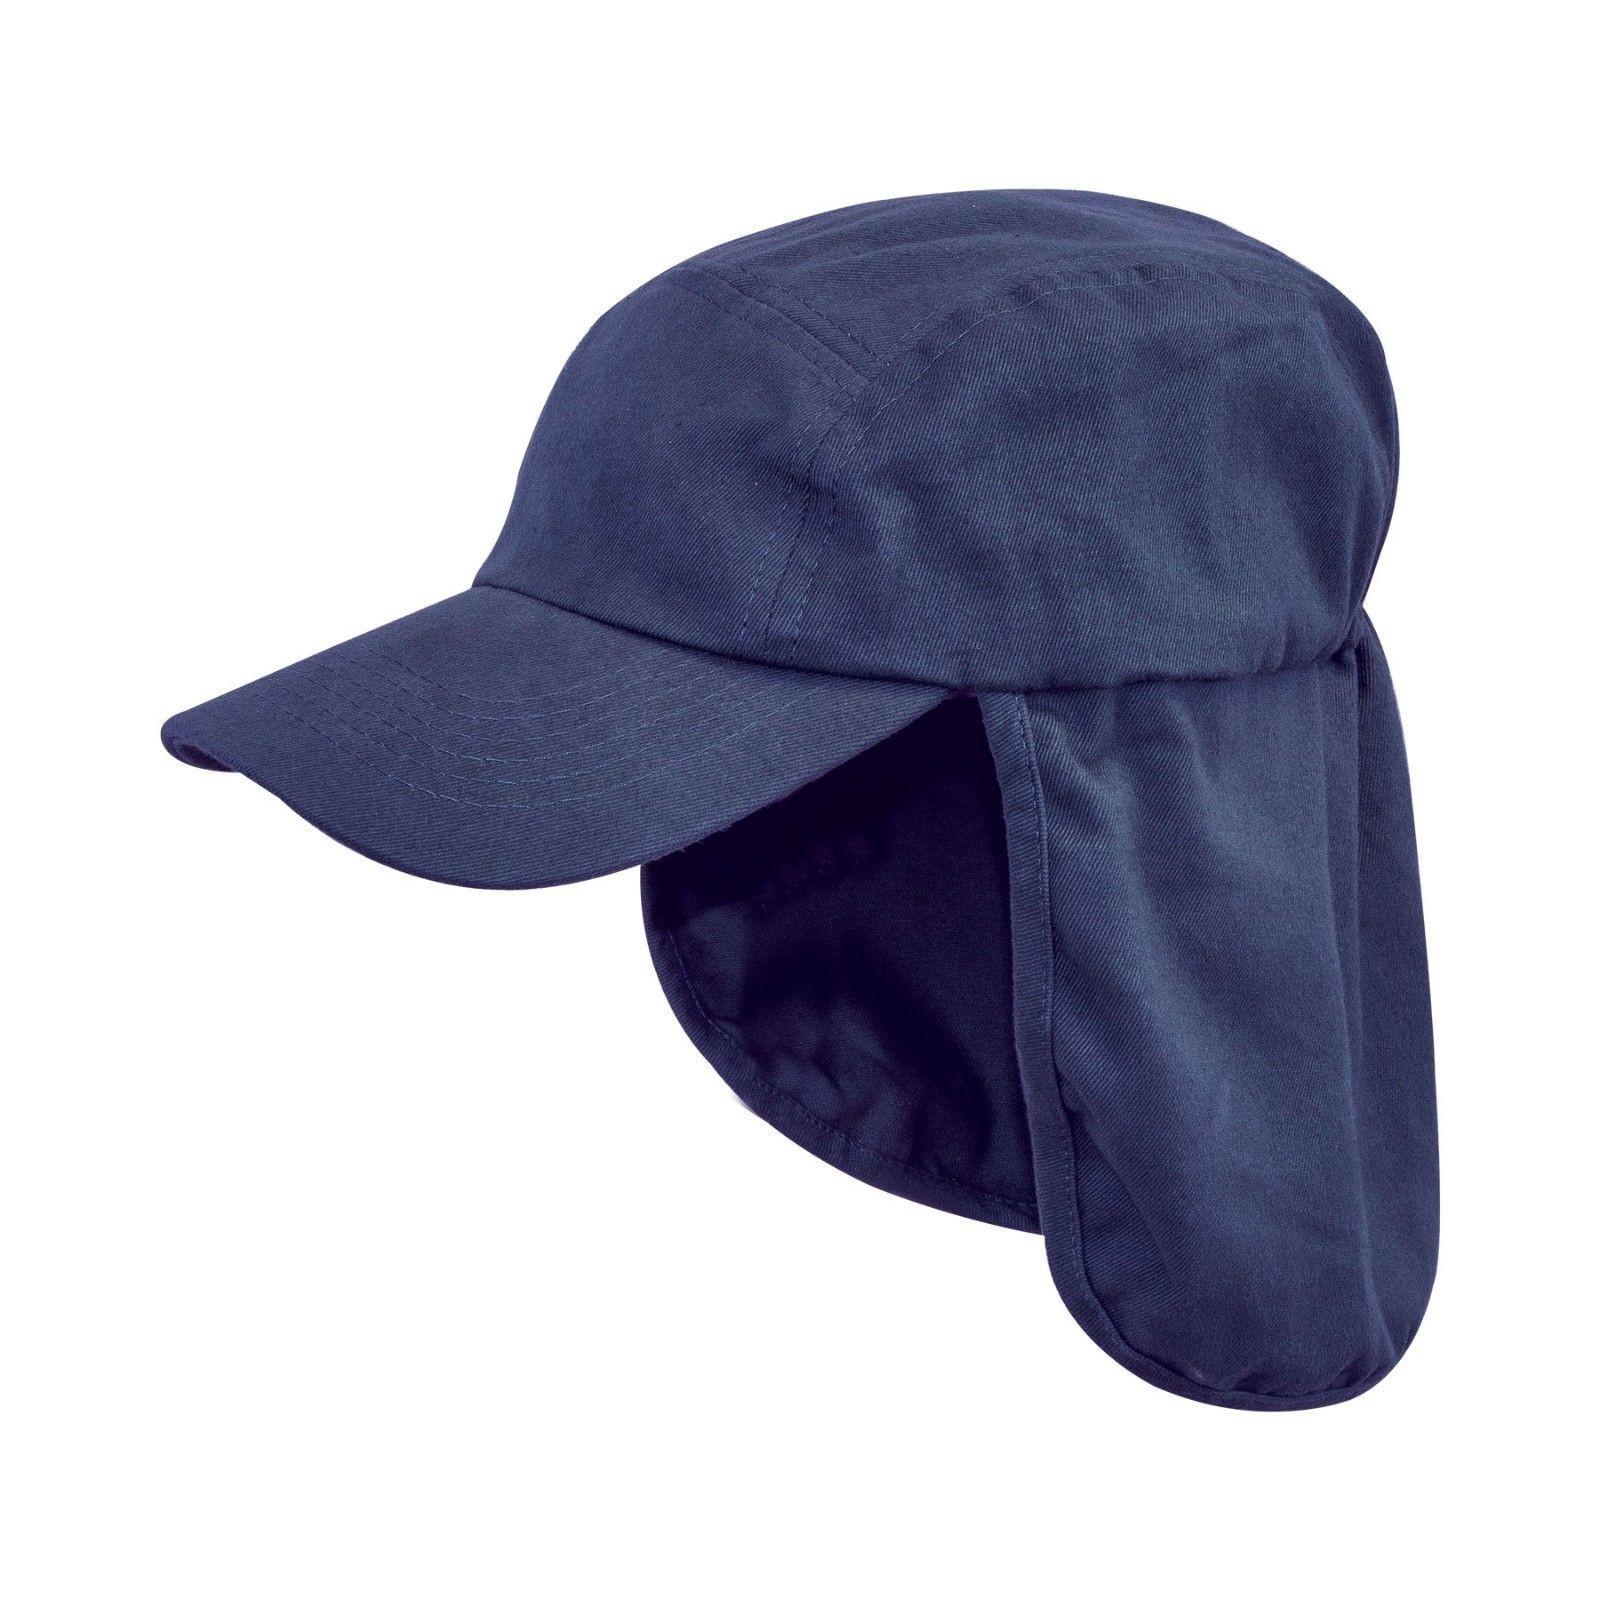 3e5d8826 Highlander Legionnaires Hat Sun Hat Kepi Neck Flap Summer Cotton Peaked Navy